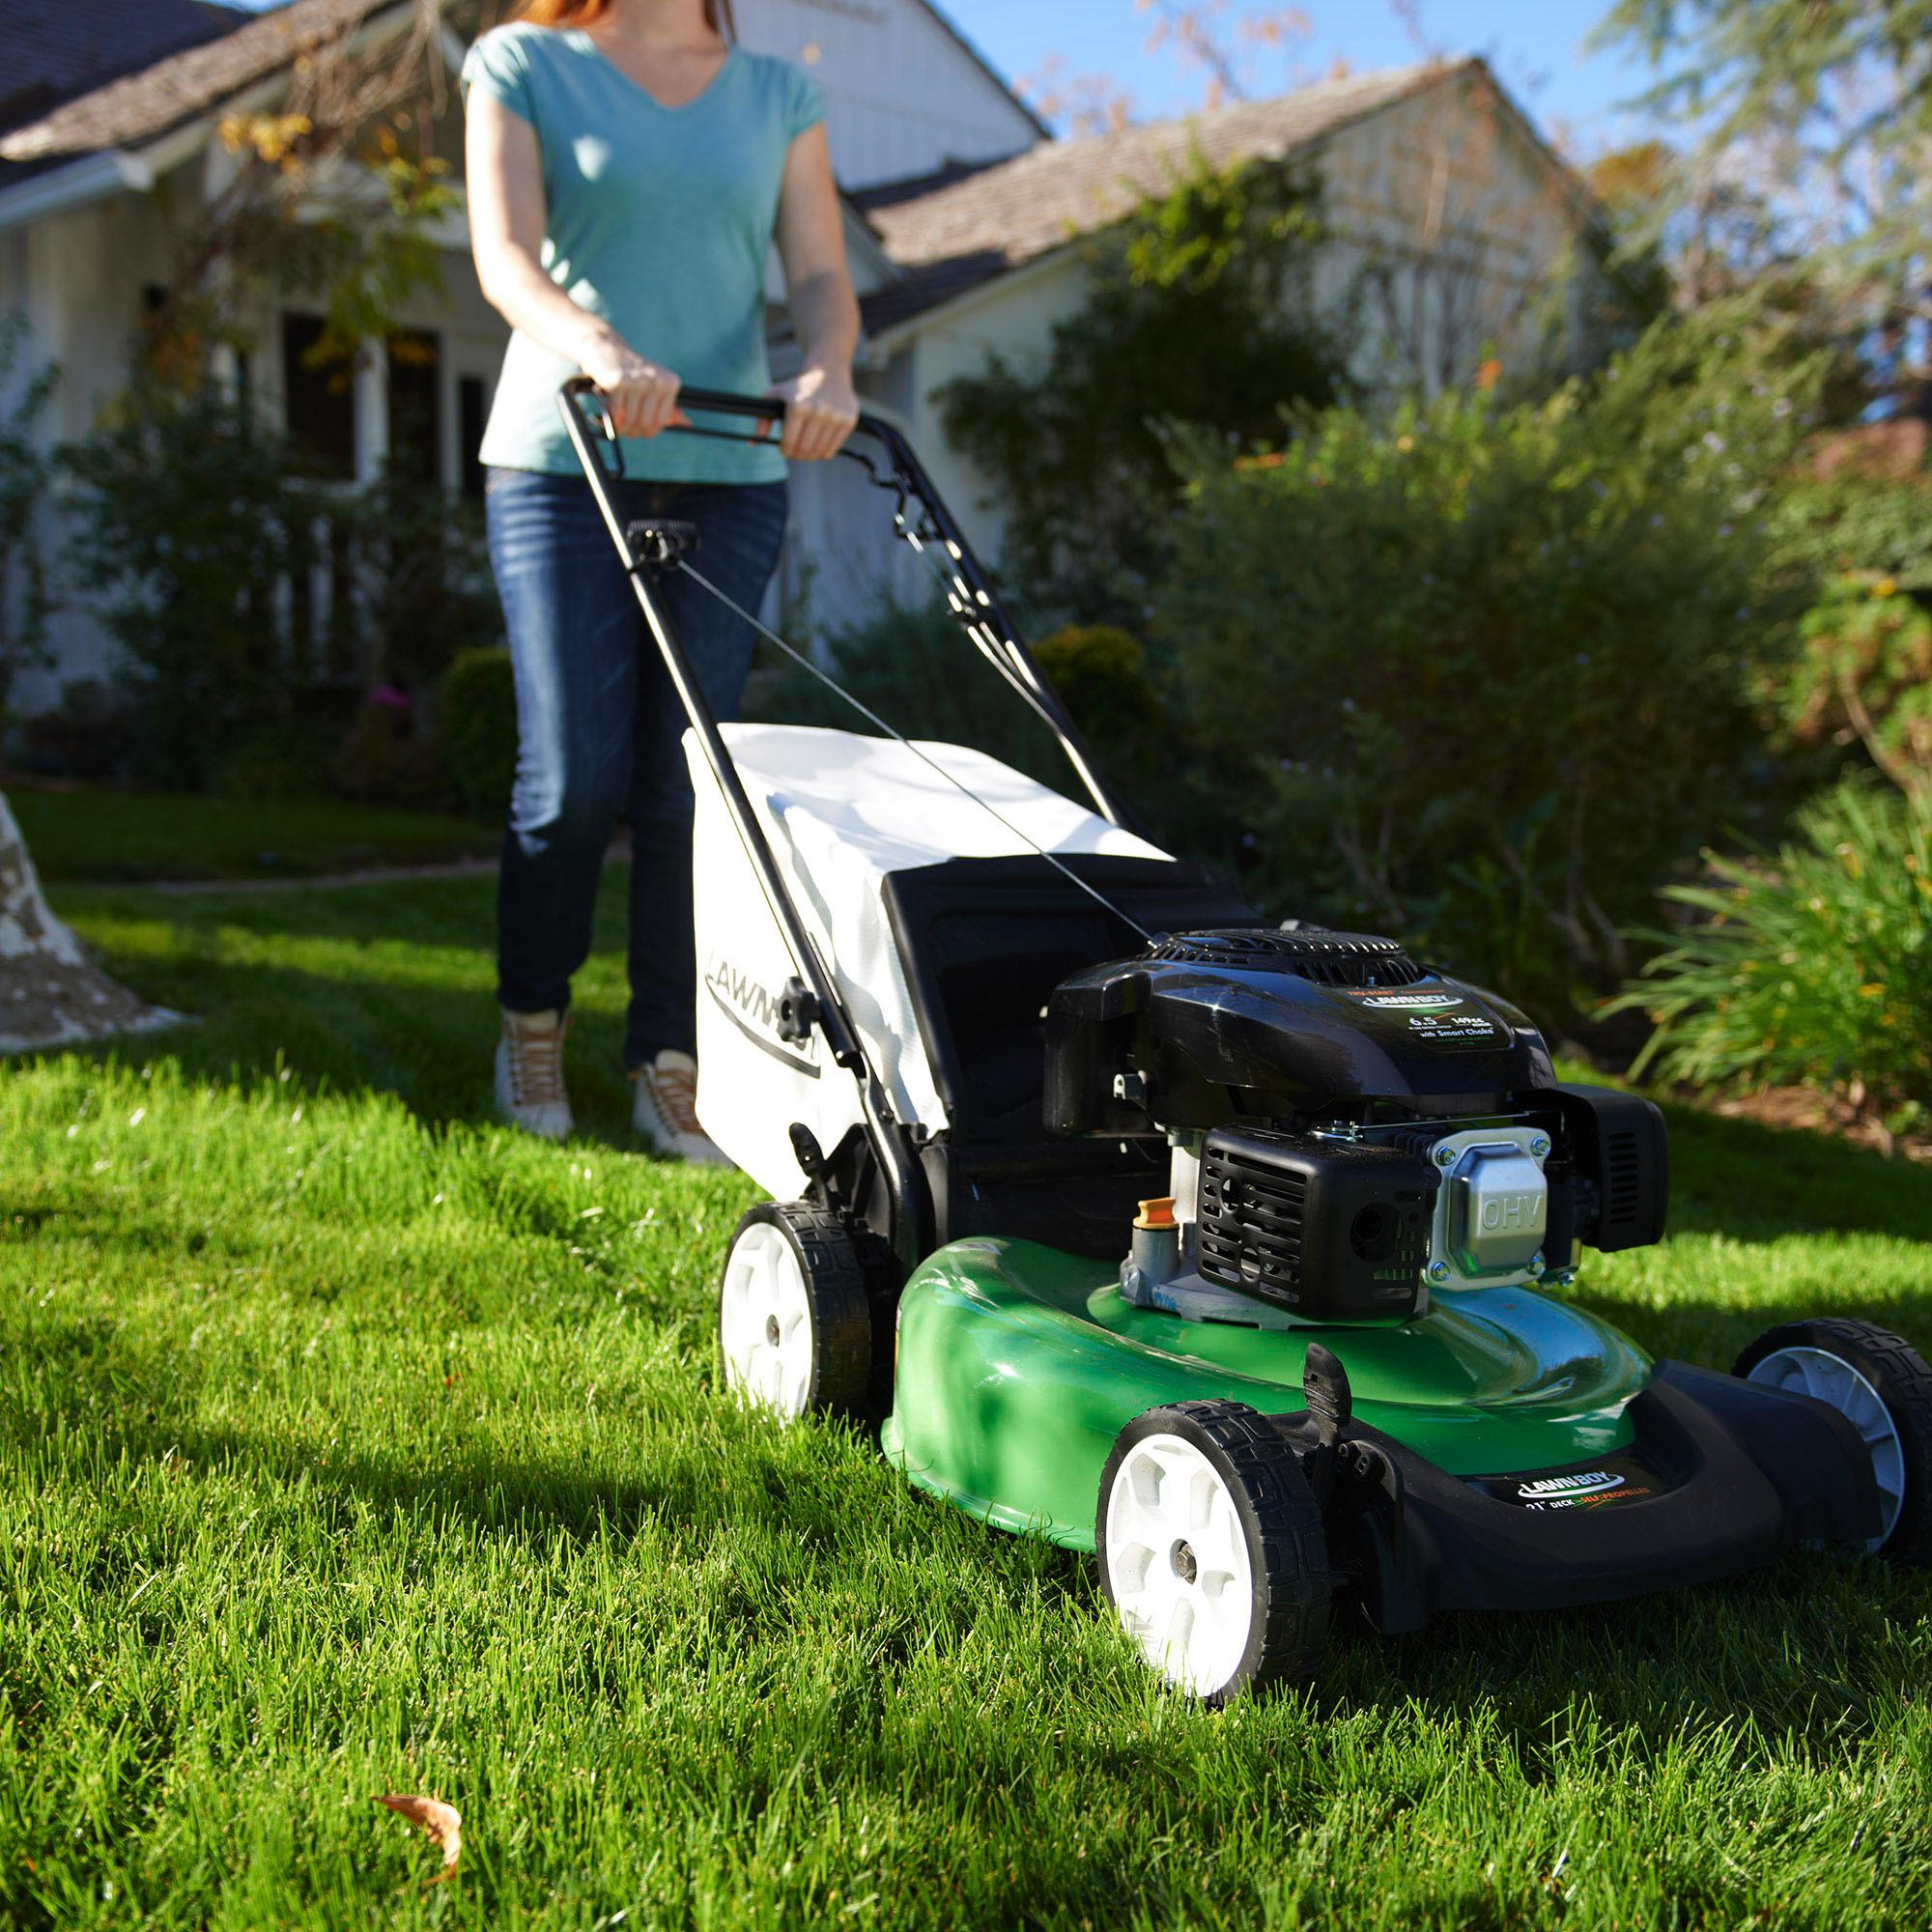 Amazon.com : Lawn-Boy 10732 Kohler XT6 OHV, Rear Wheel